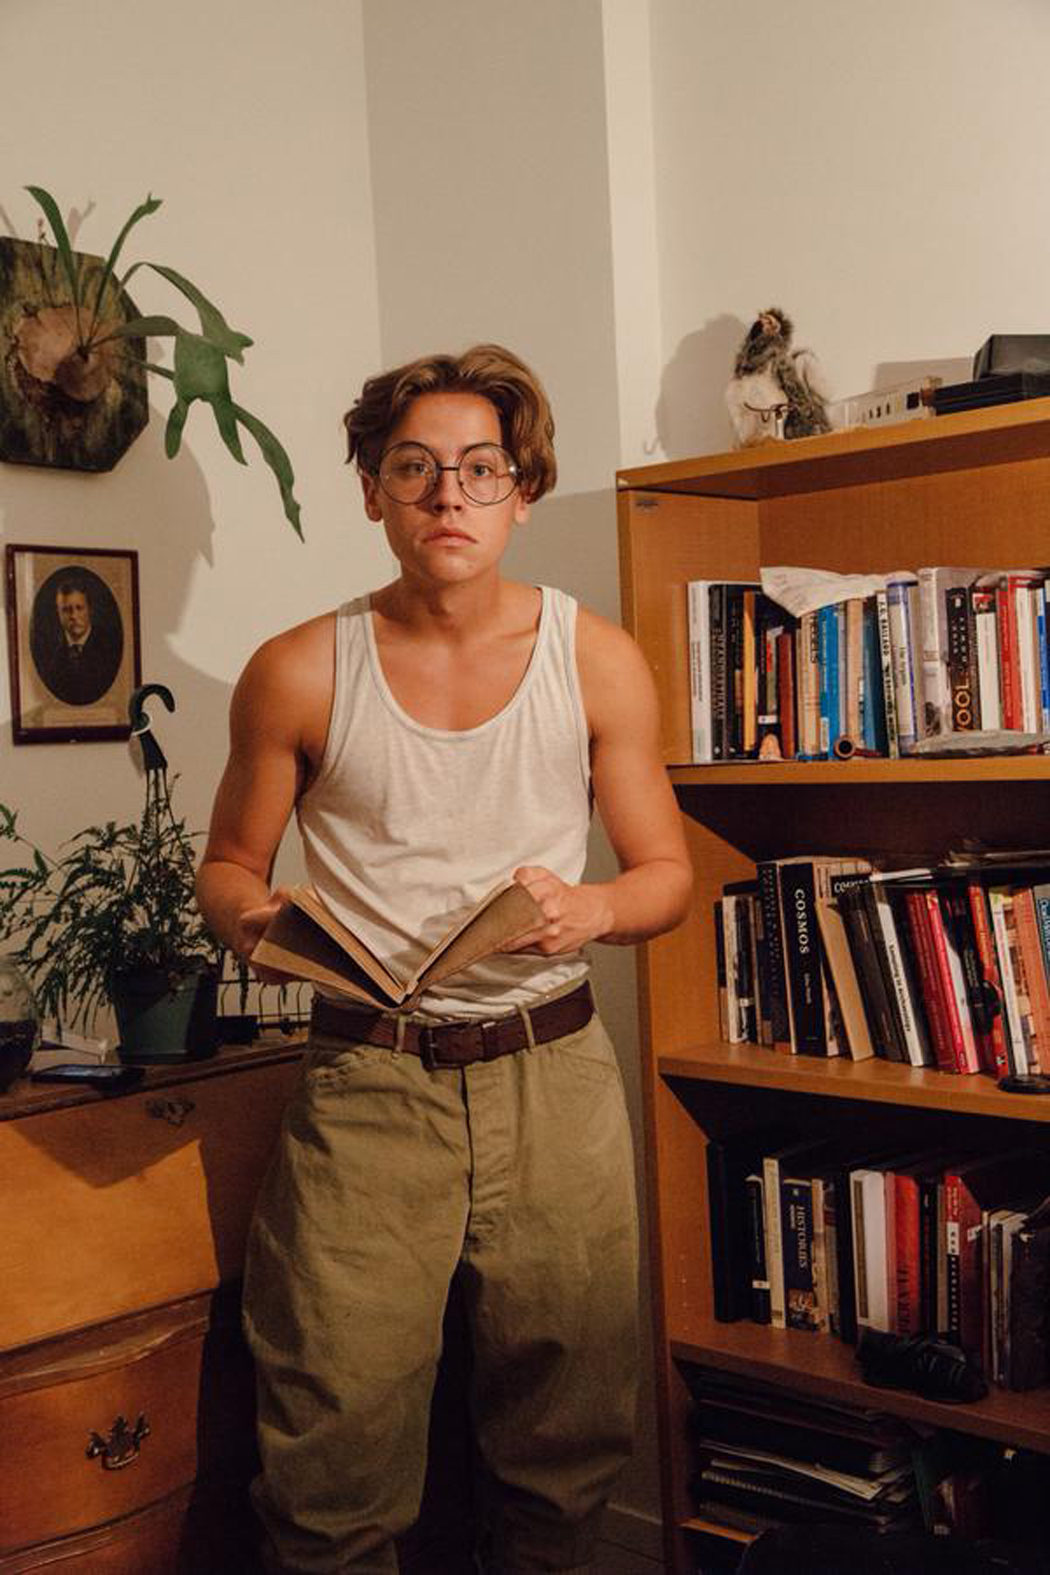 Cole Sprouse se disfraza de Milo Thatch